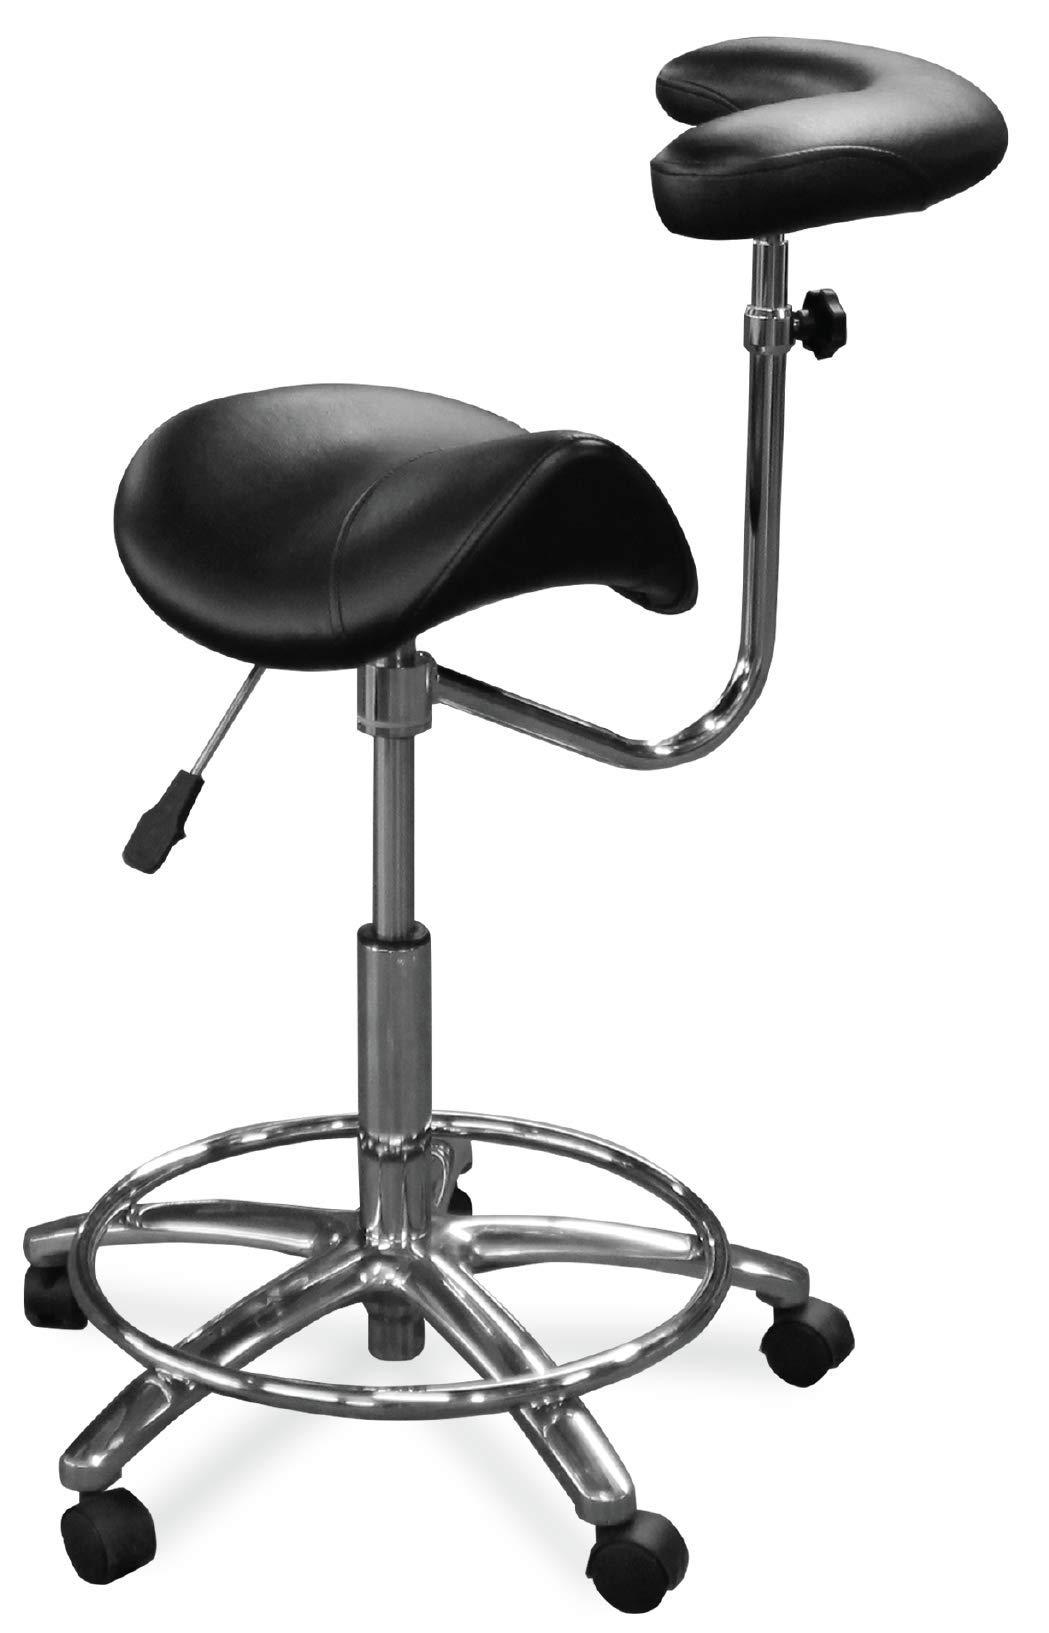 Dentists Unite 4025-17 Dental Assistant Saddle Stool with Body Arm, Bone